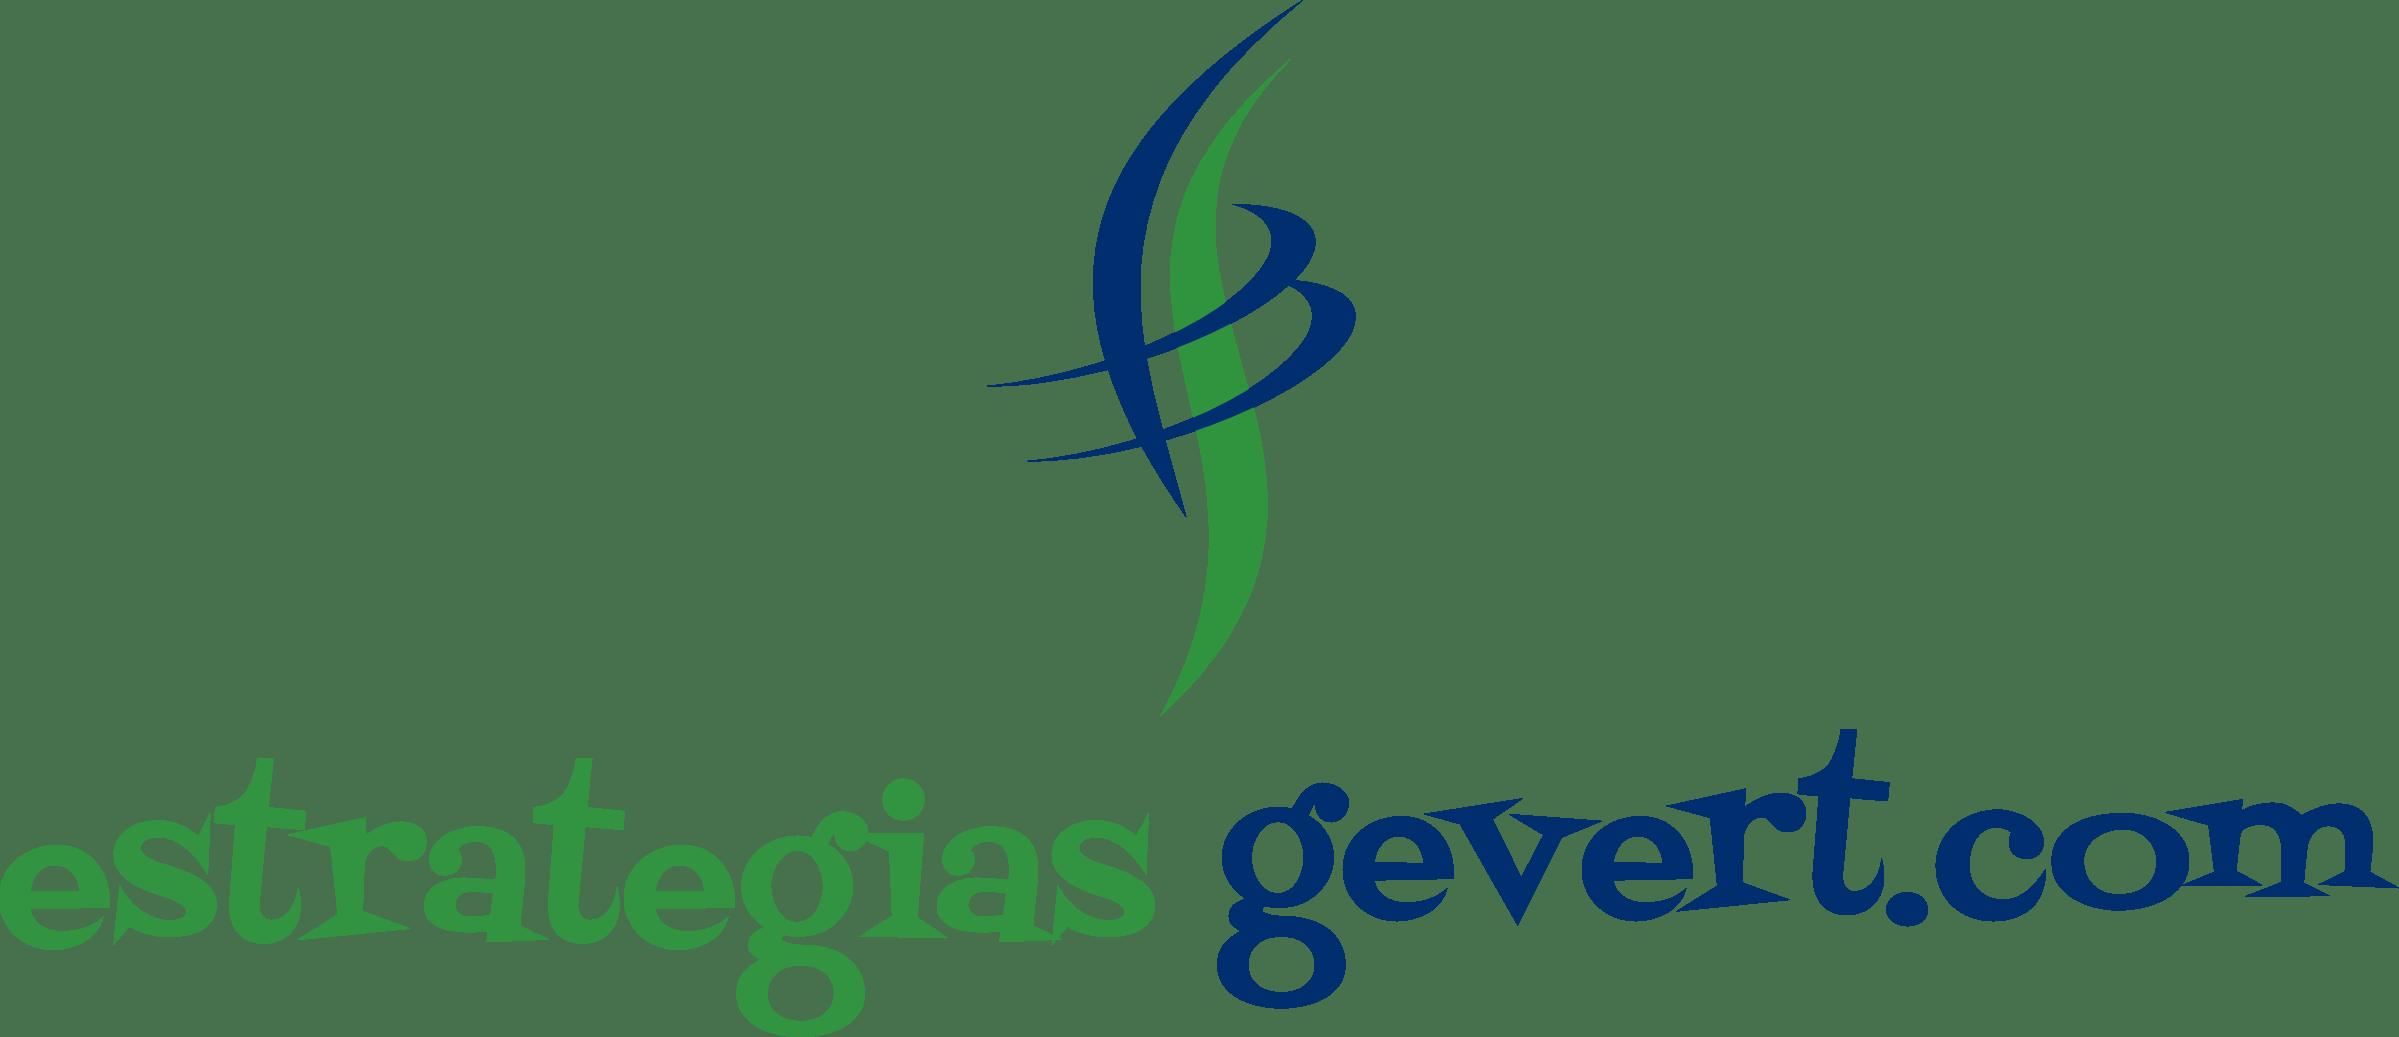 www.gevert.com